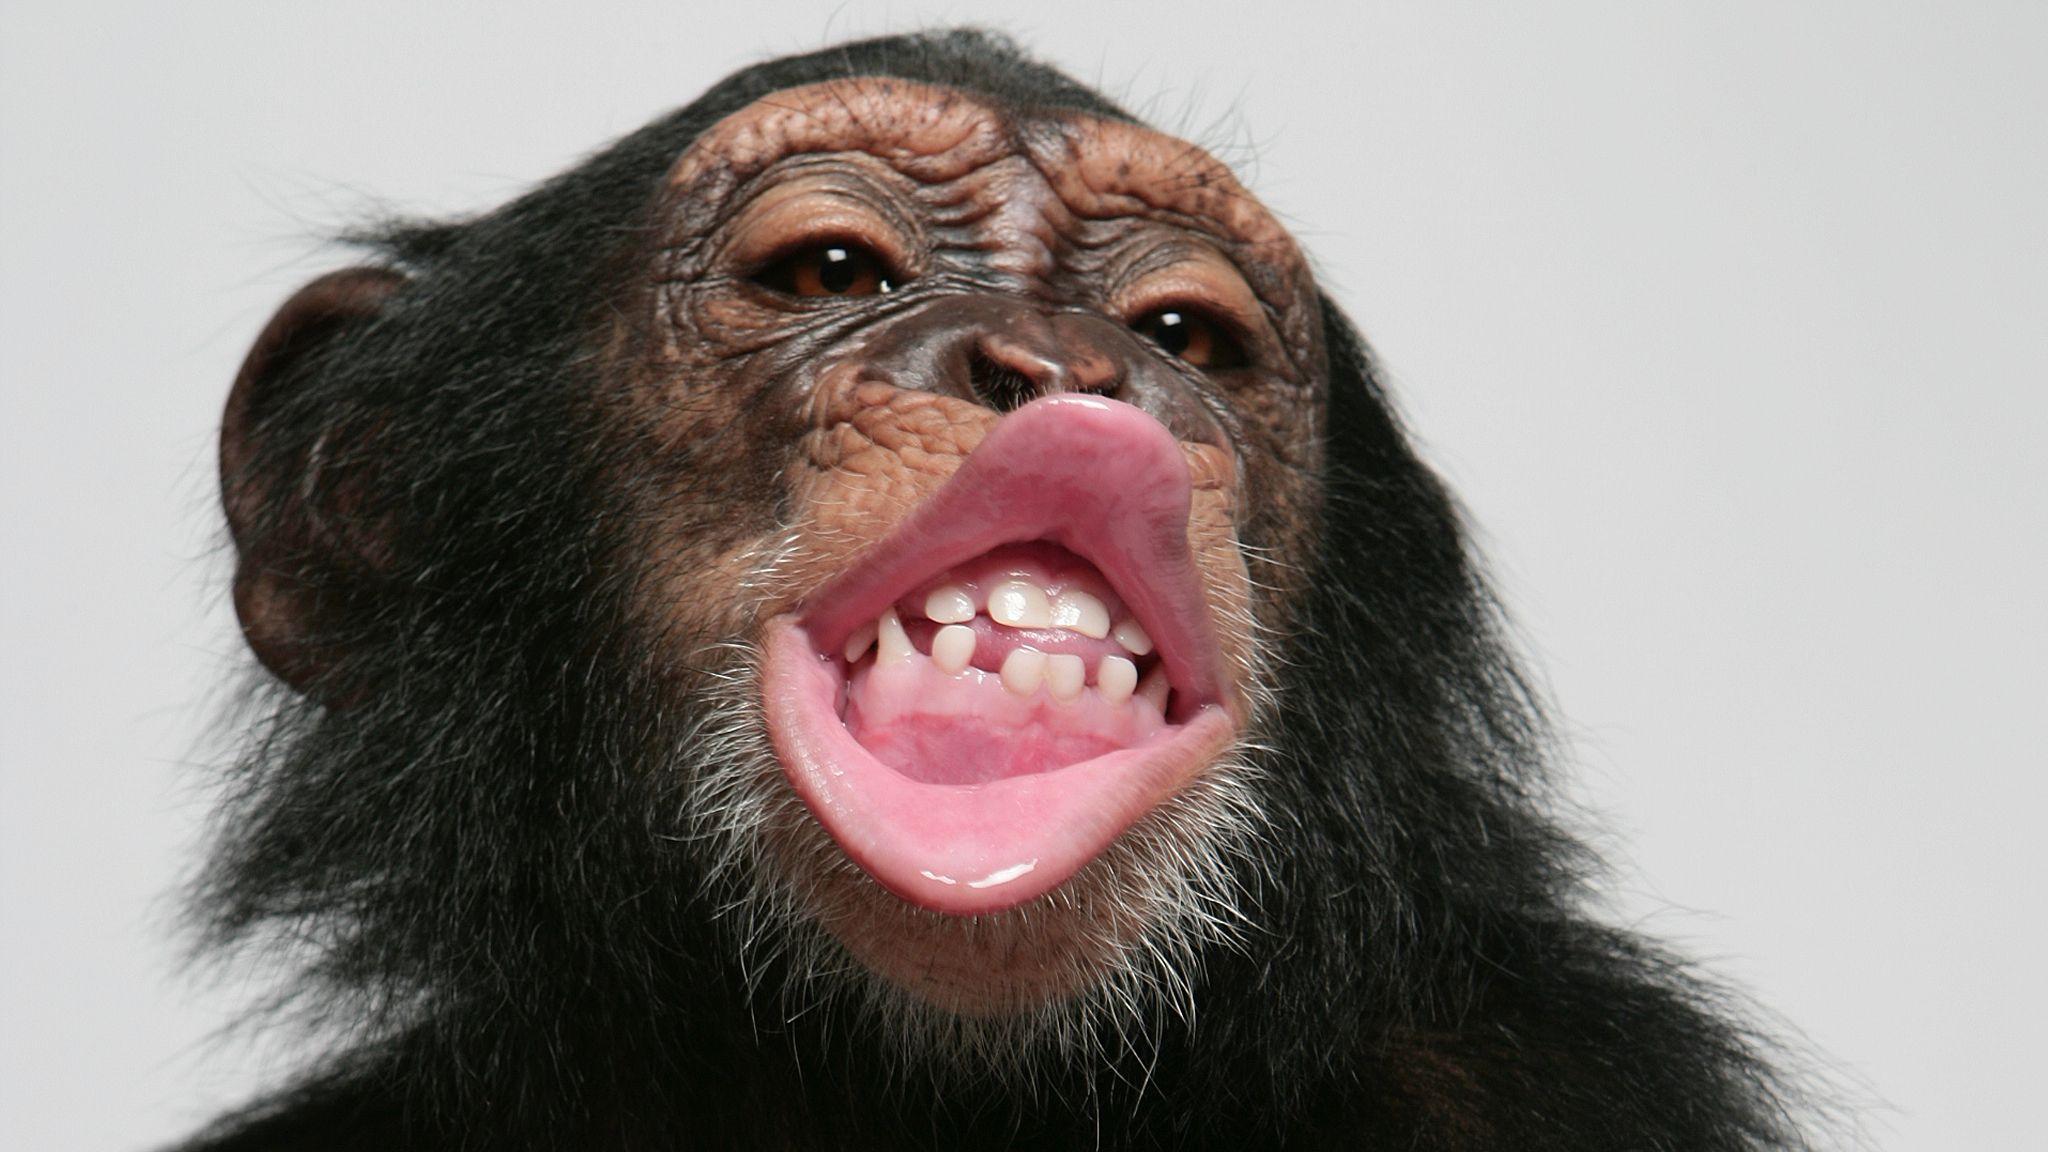 Chimp lip smacking could solve mystery of human speech evolution   UK News    Sky News